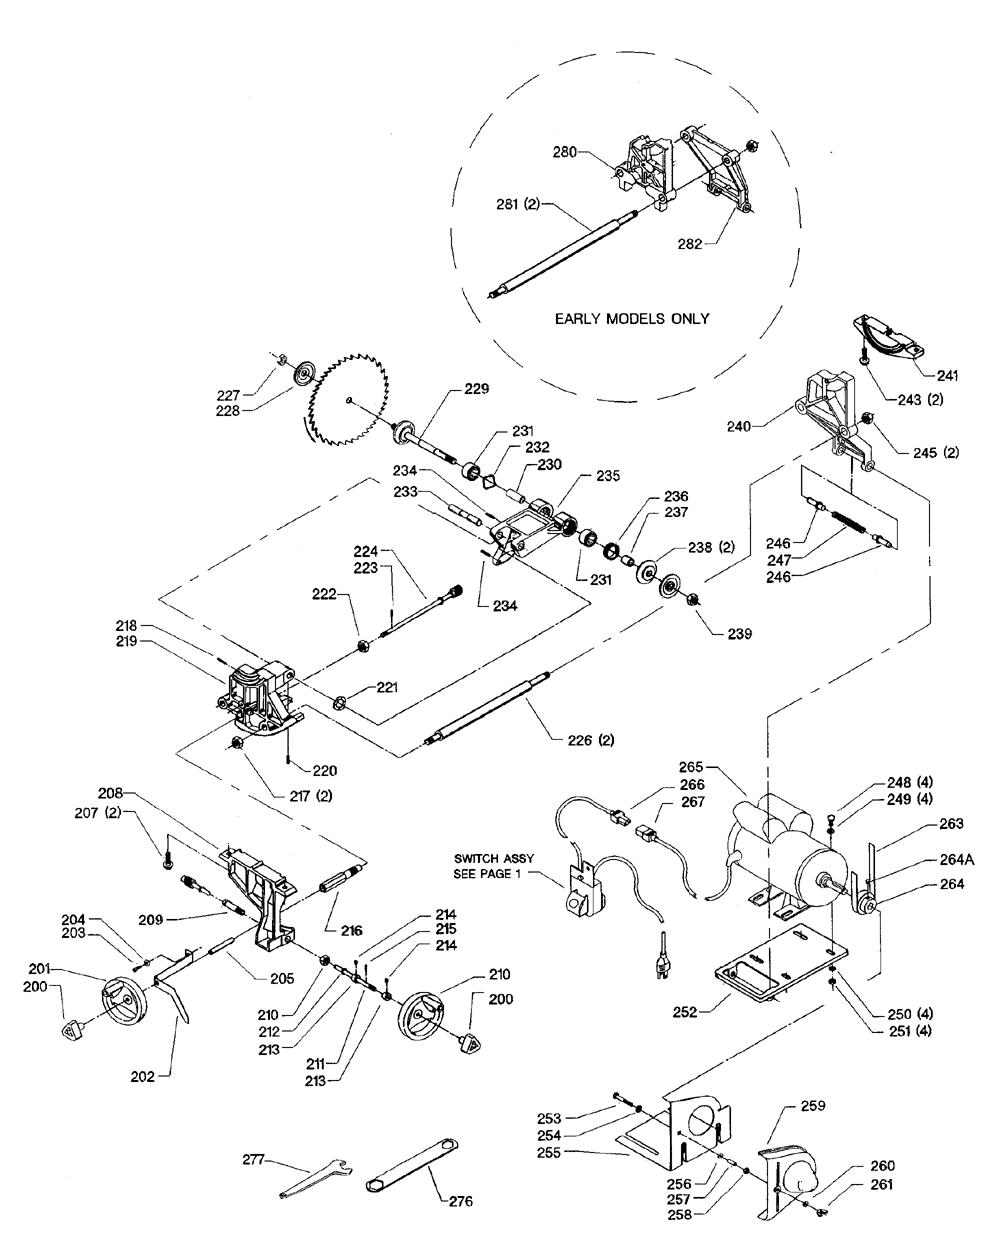 36-480-delta-PB-1Break Down